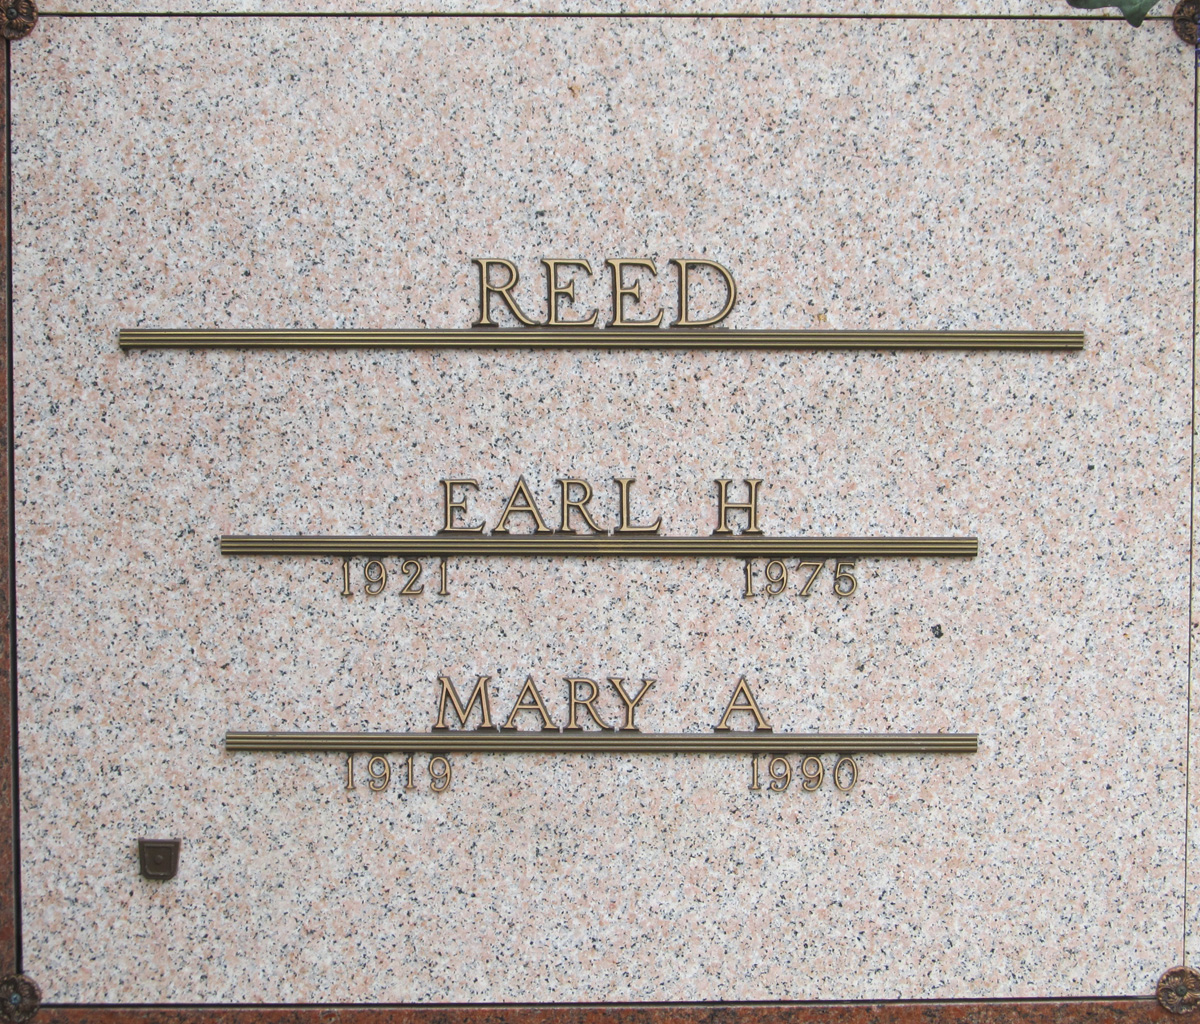 Earl H. Reed